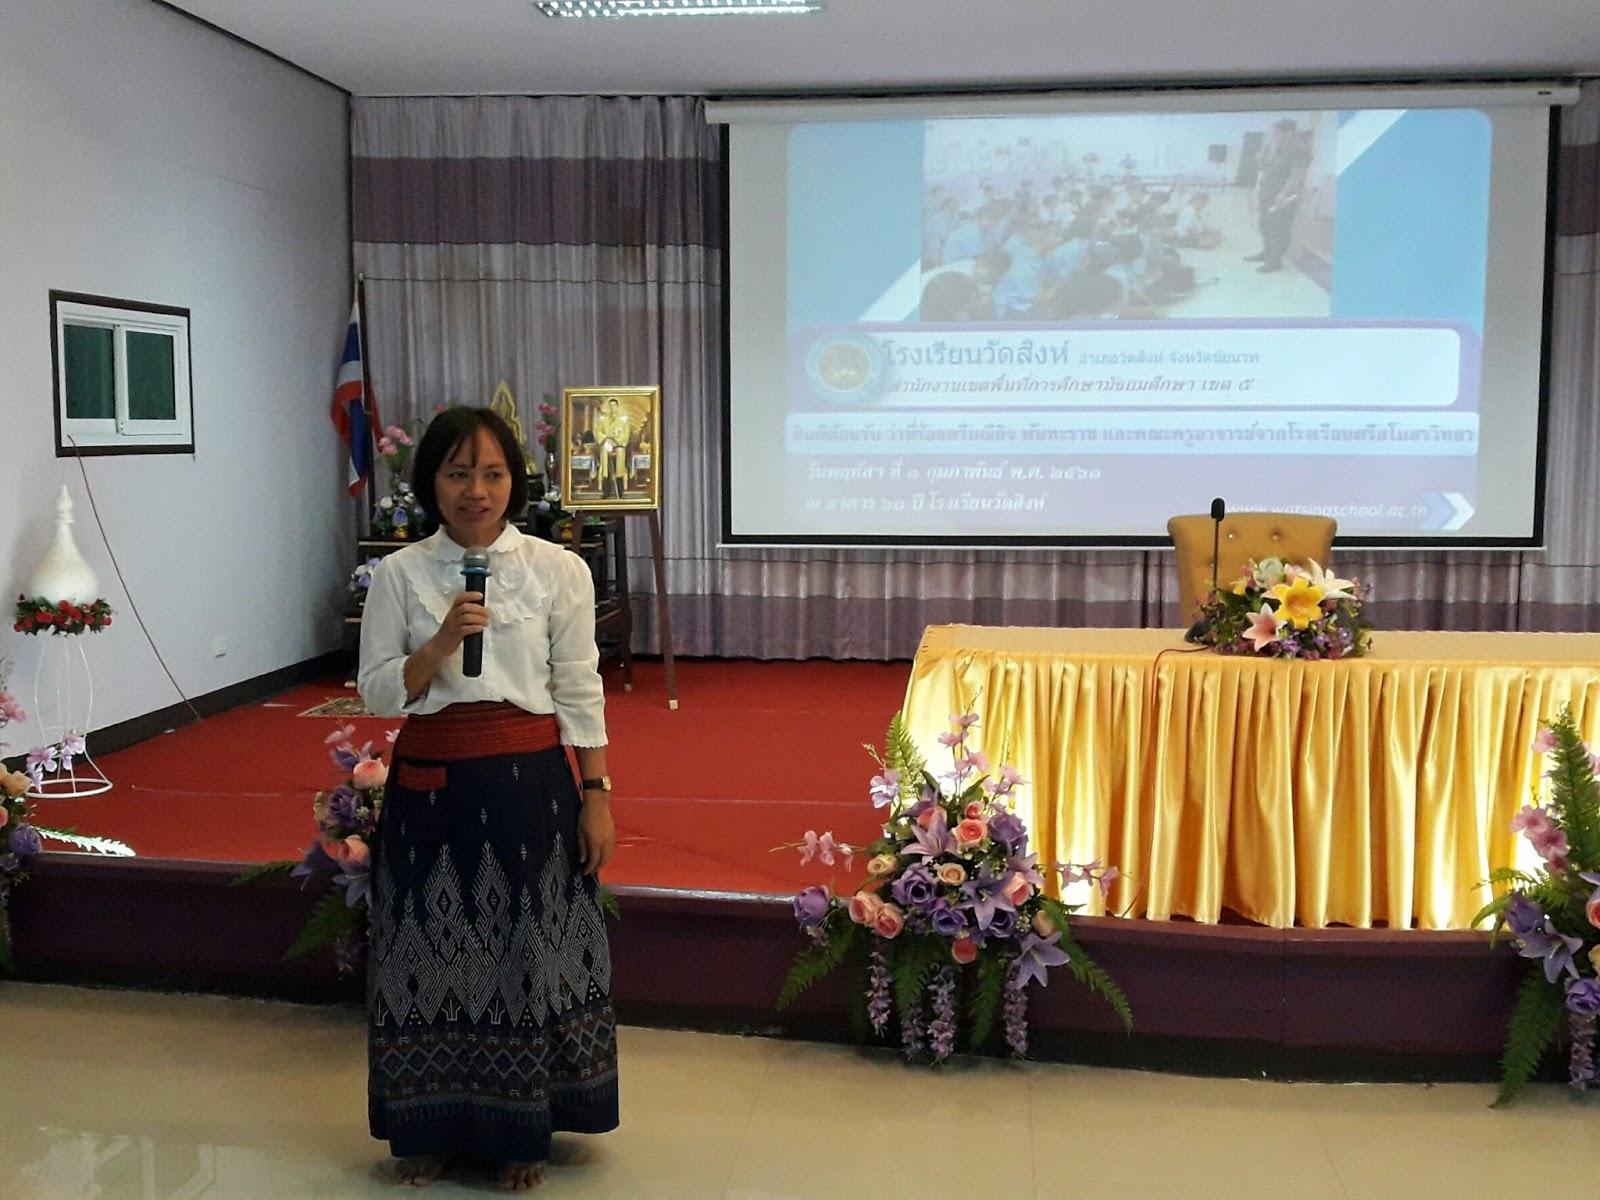 Welcome New Teacher (T Maneekit) ~ Watsing School